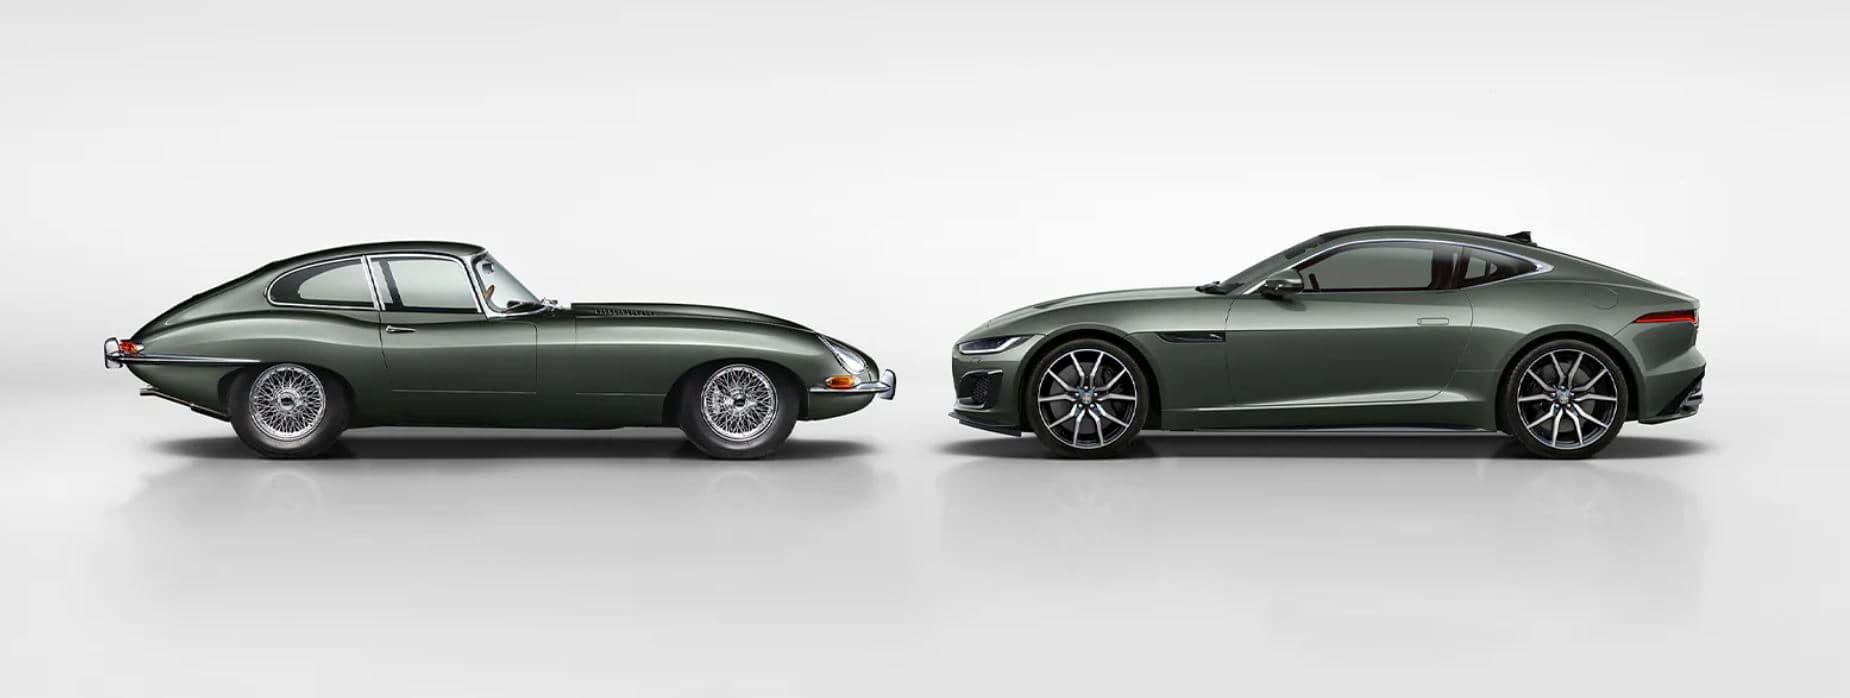 2021 Jaguar F-TYPE 60 Edition